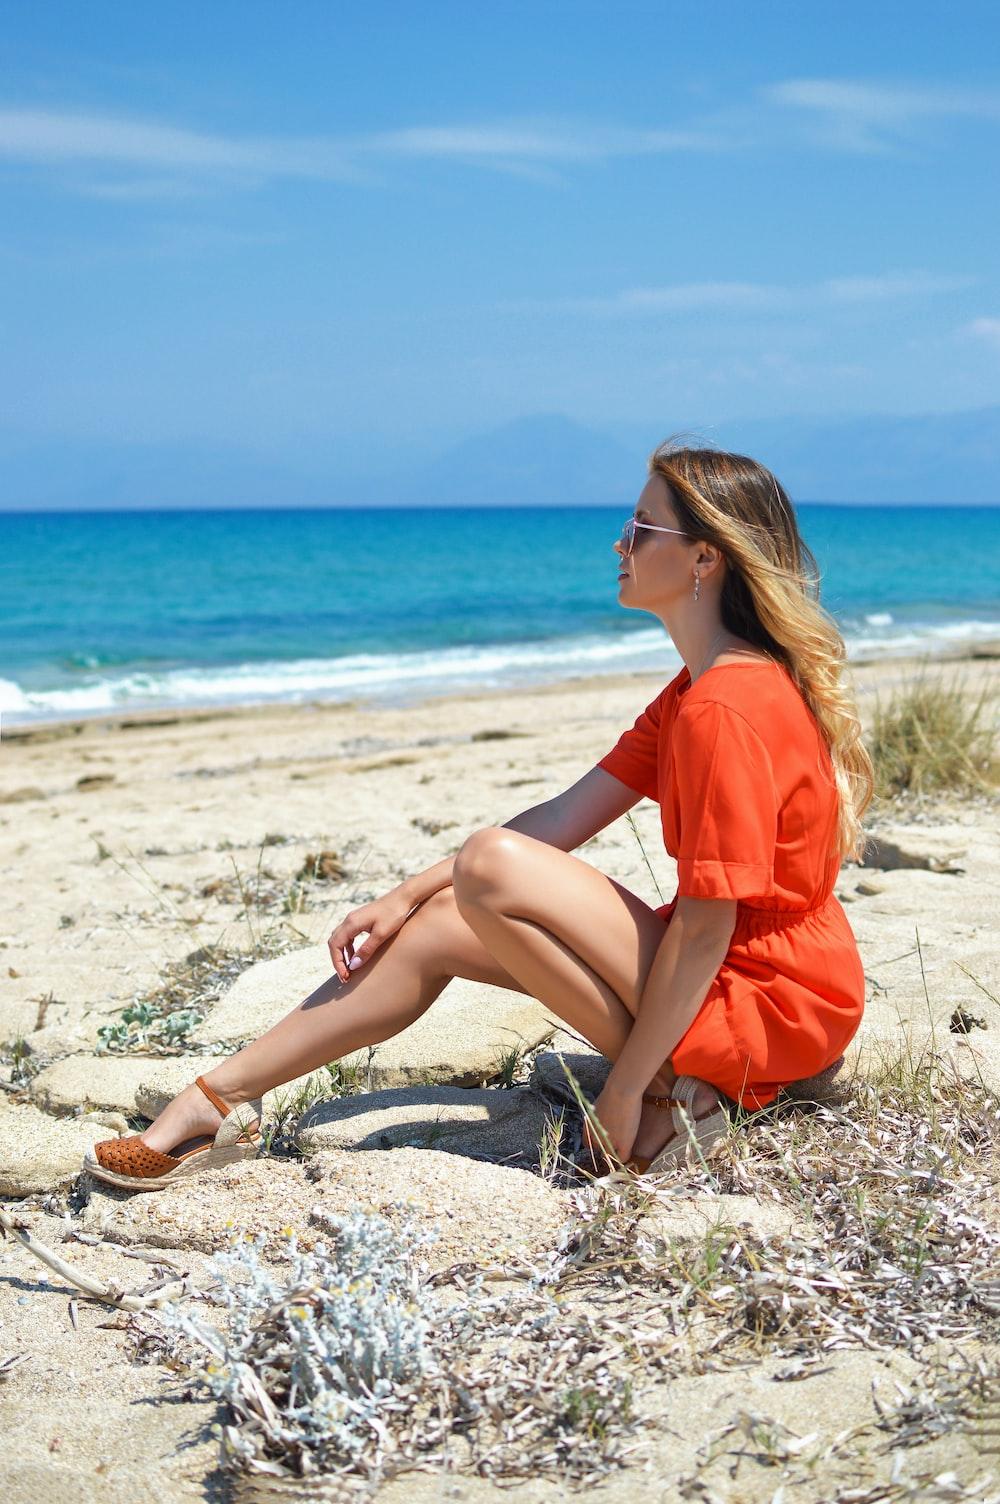 woman in orange dress sitting on beach shore during daytime